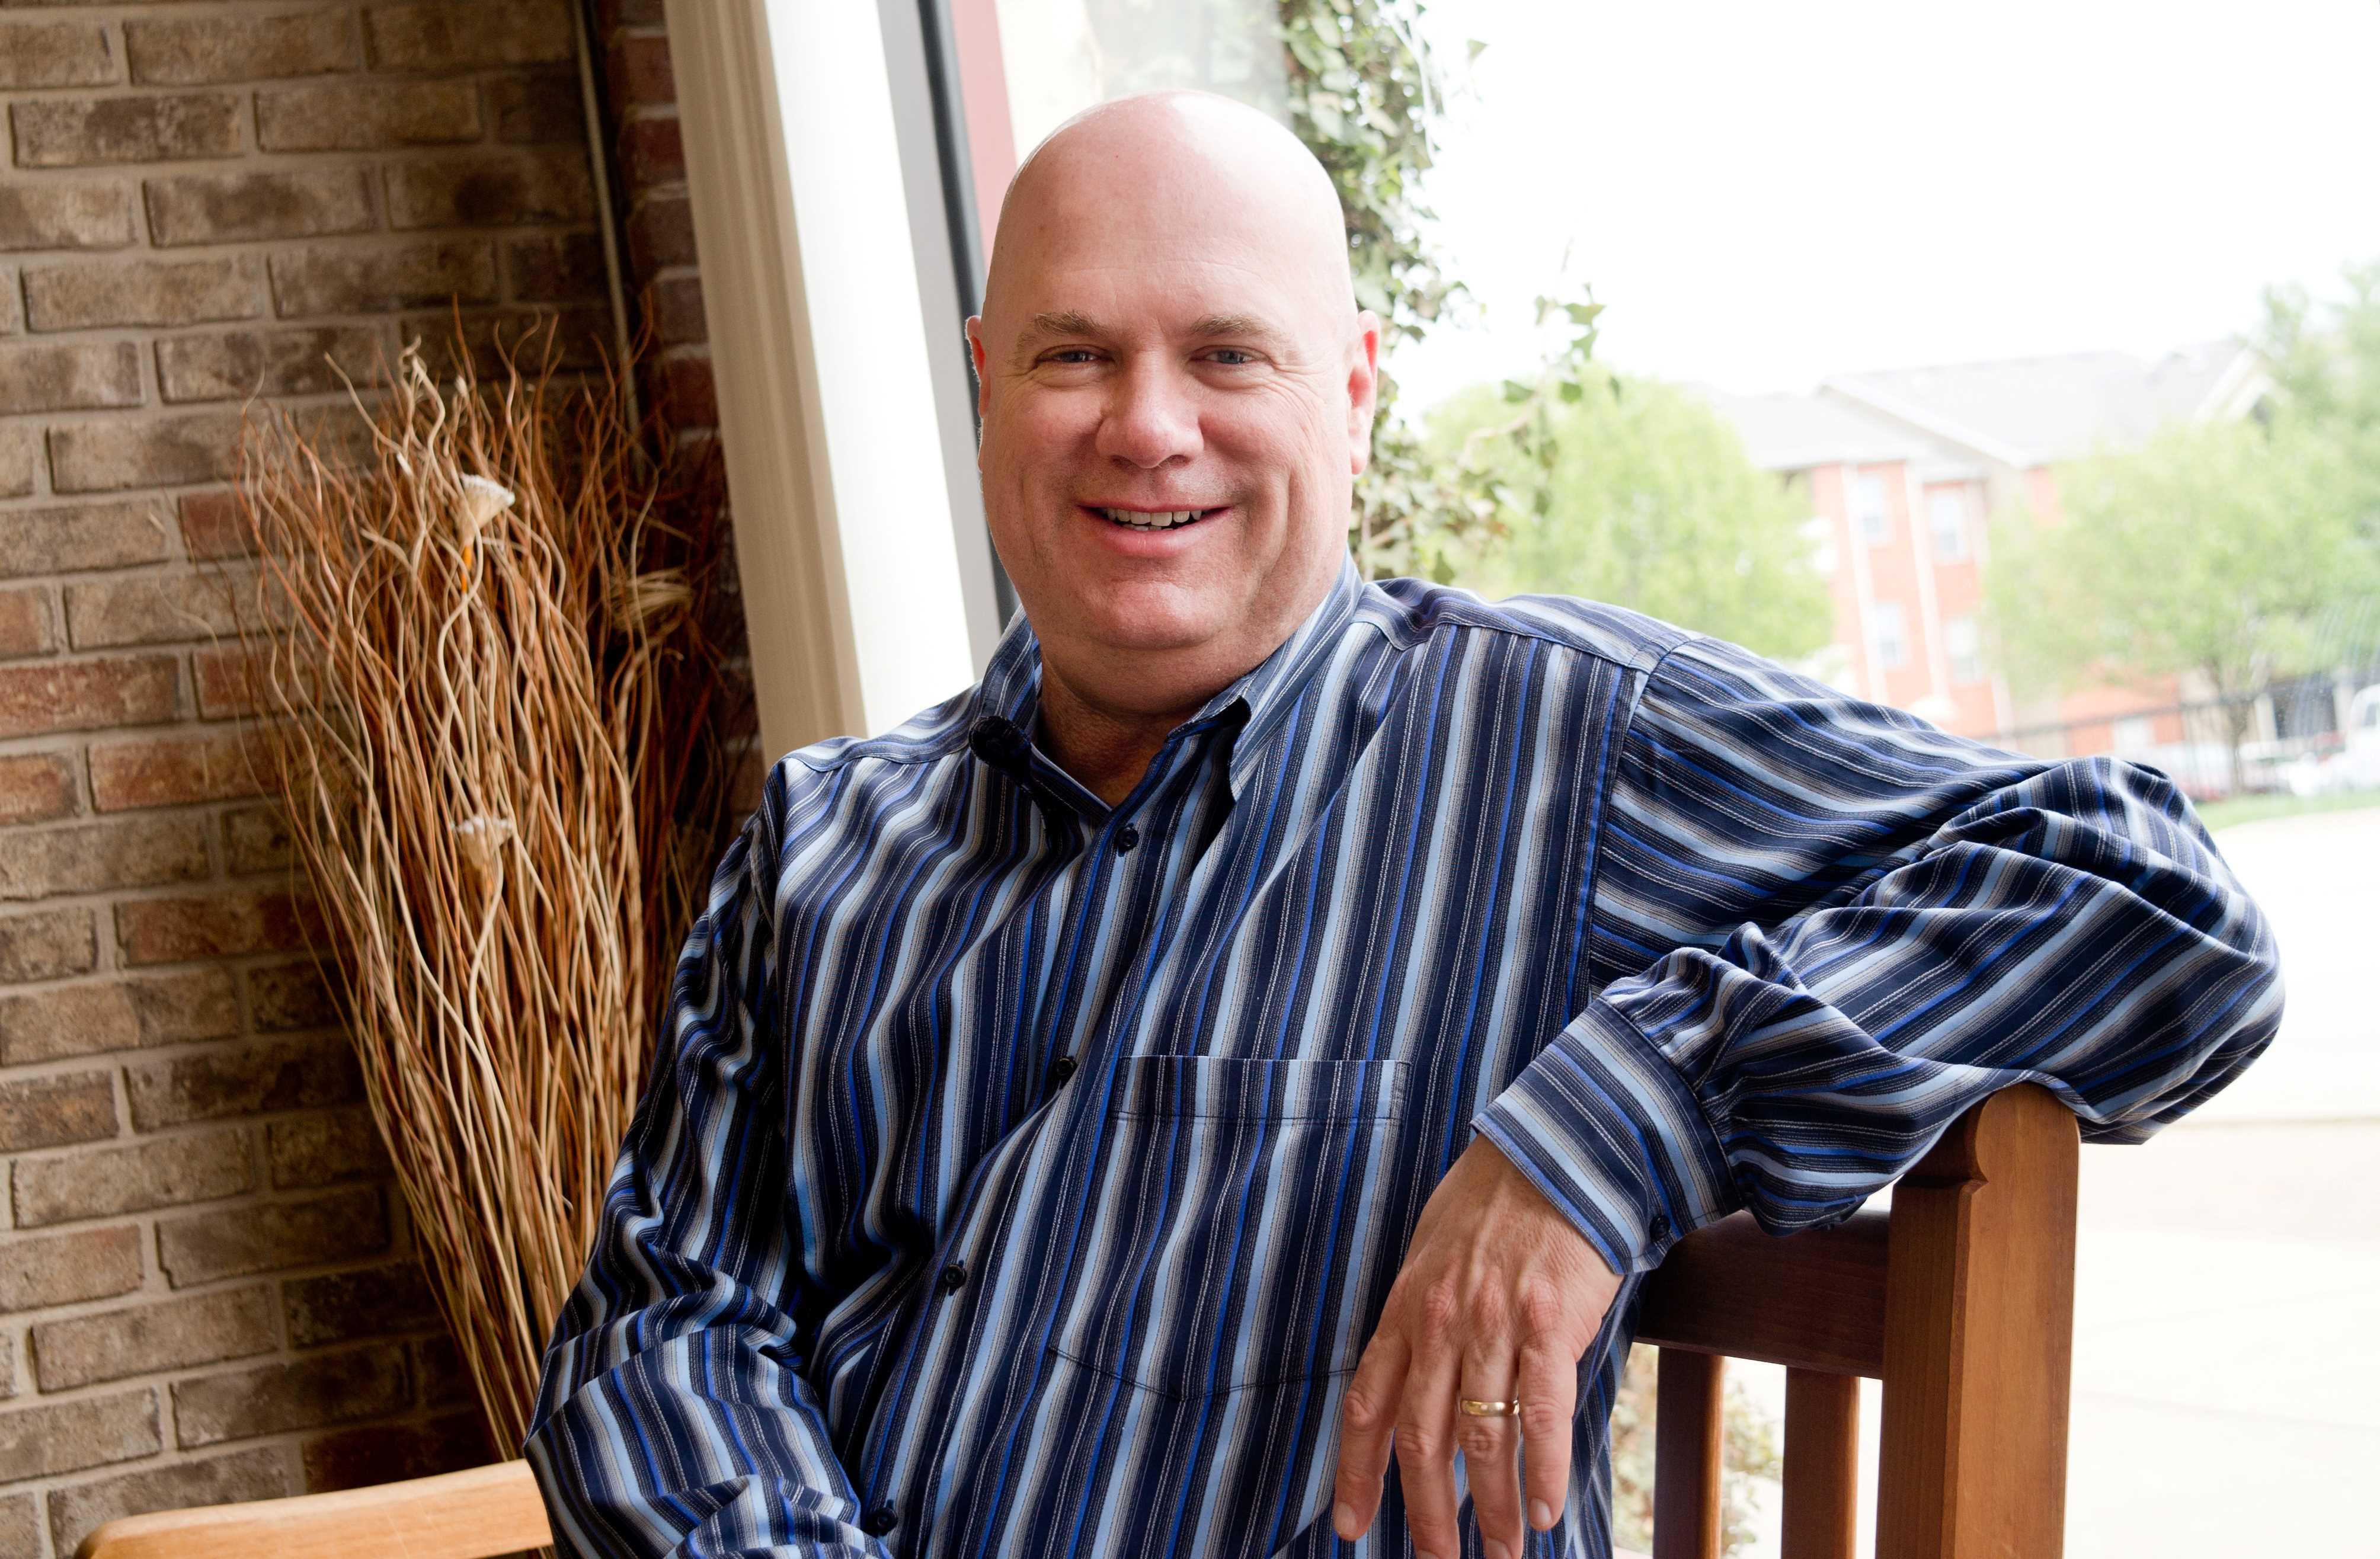 Meet The Staff - Top Chiropractor Springfield MO - Dr Brad H'Doubler